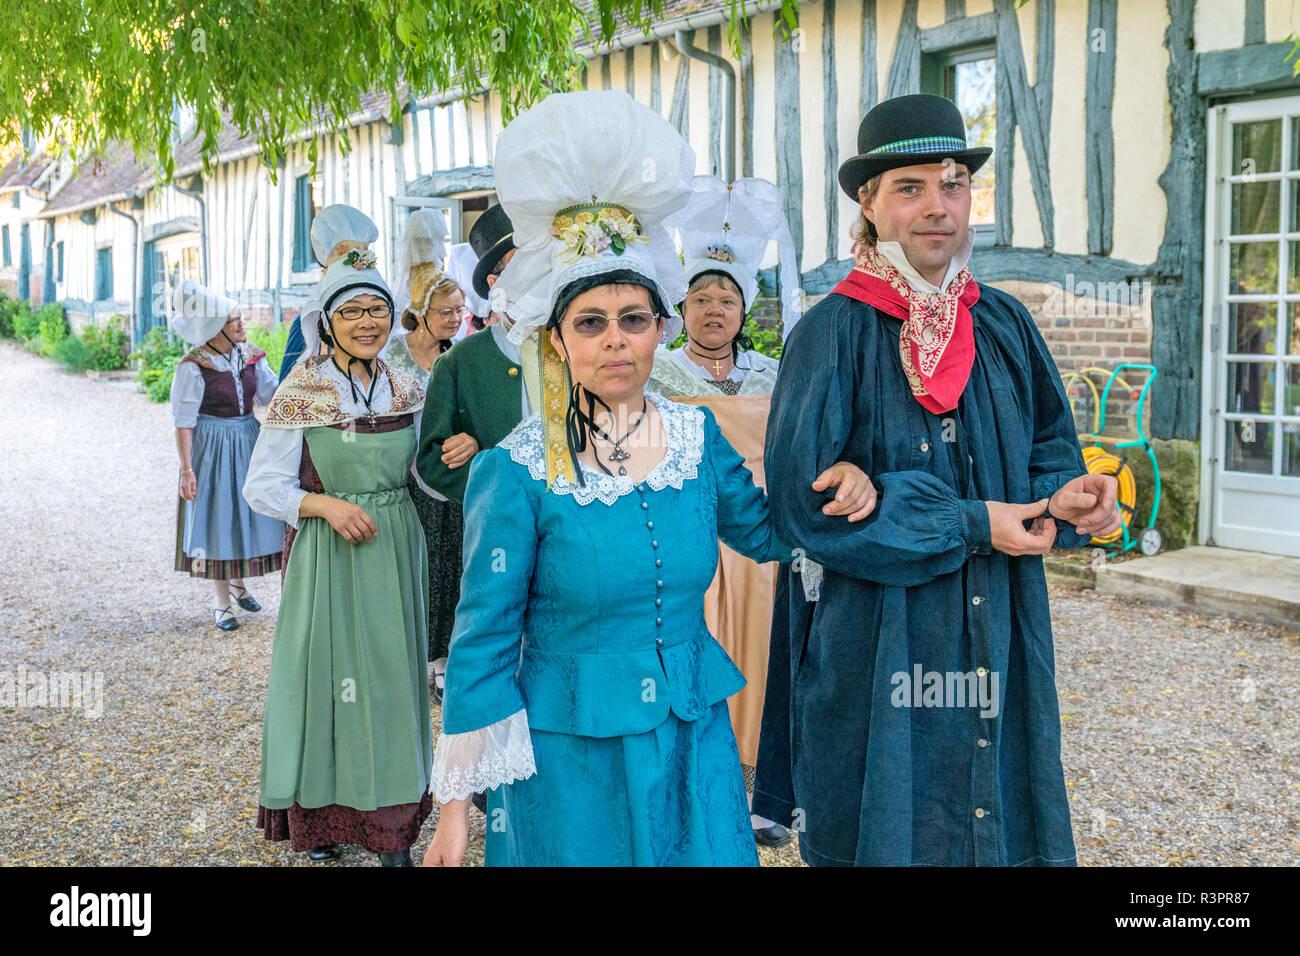 French reenactors, Commanderie de Templiers, Vexin region, France - Stock Image